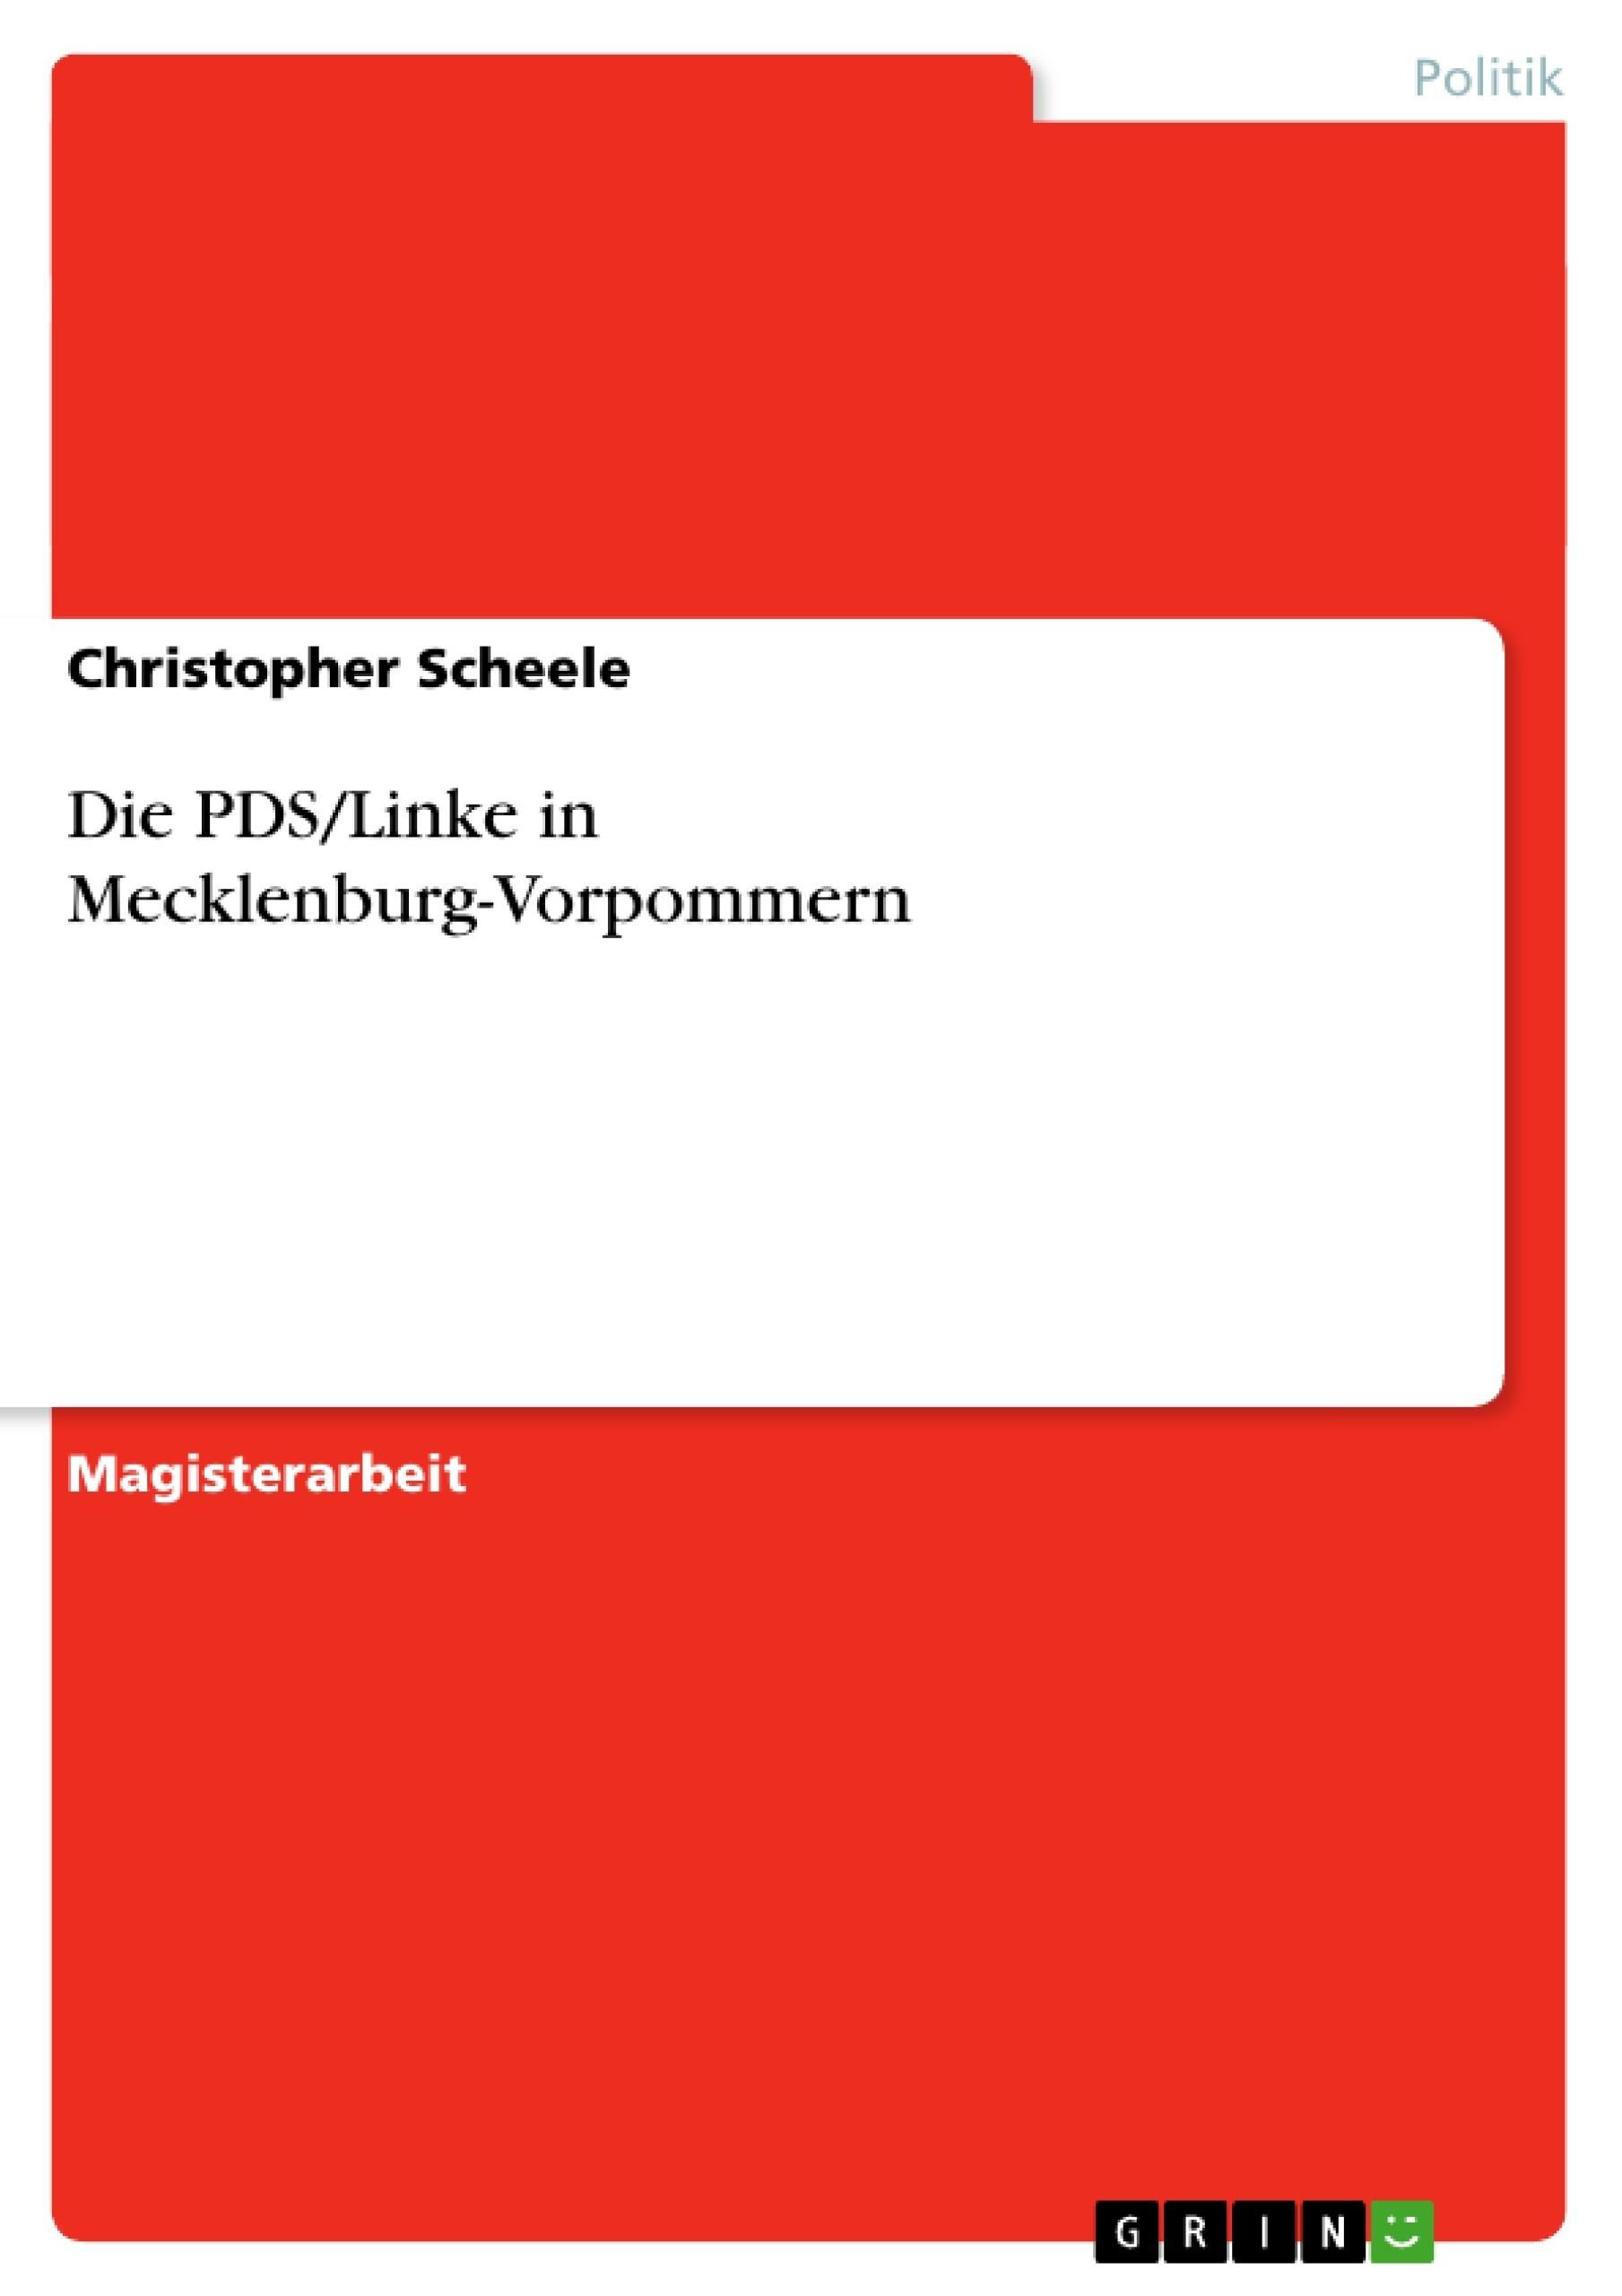 Titel: Die PDS/Linke in Mecklenburg-Vorpommern